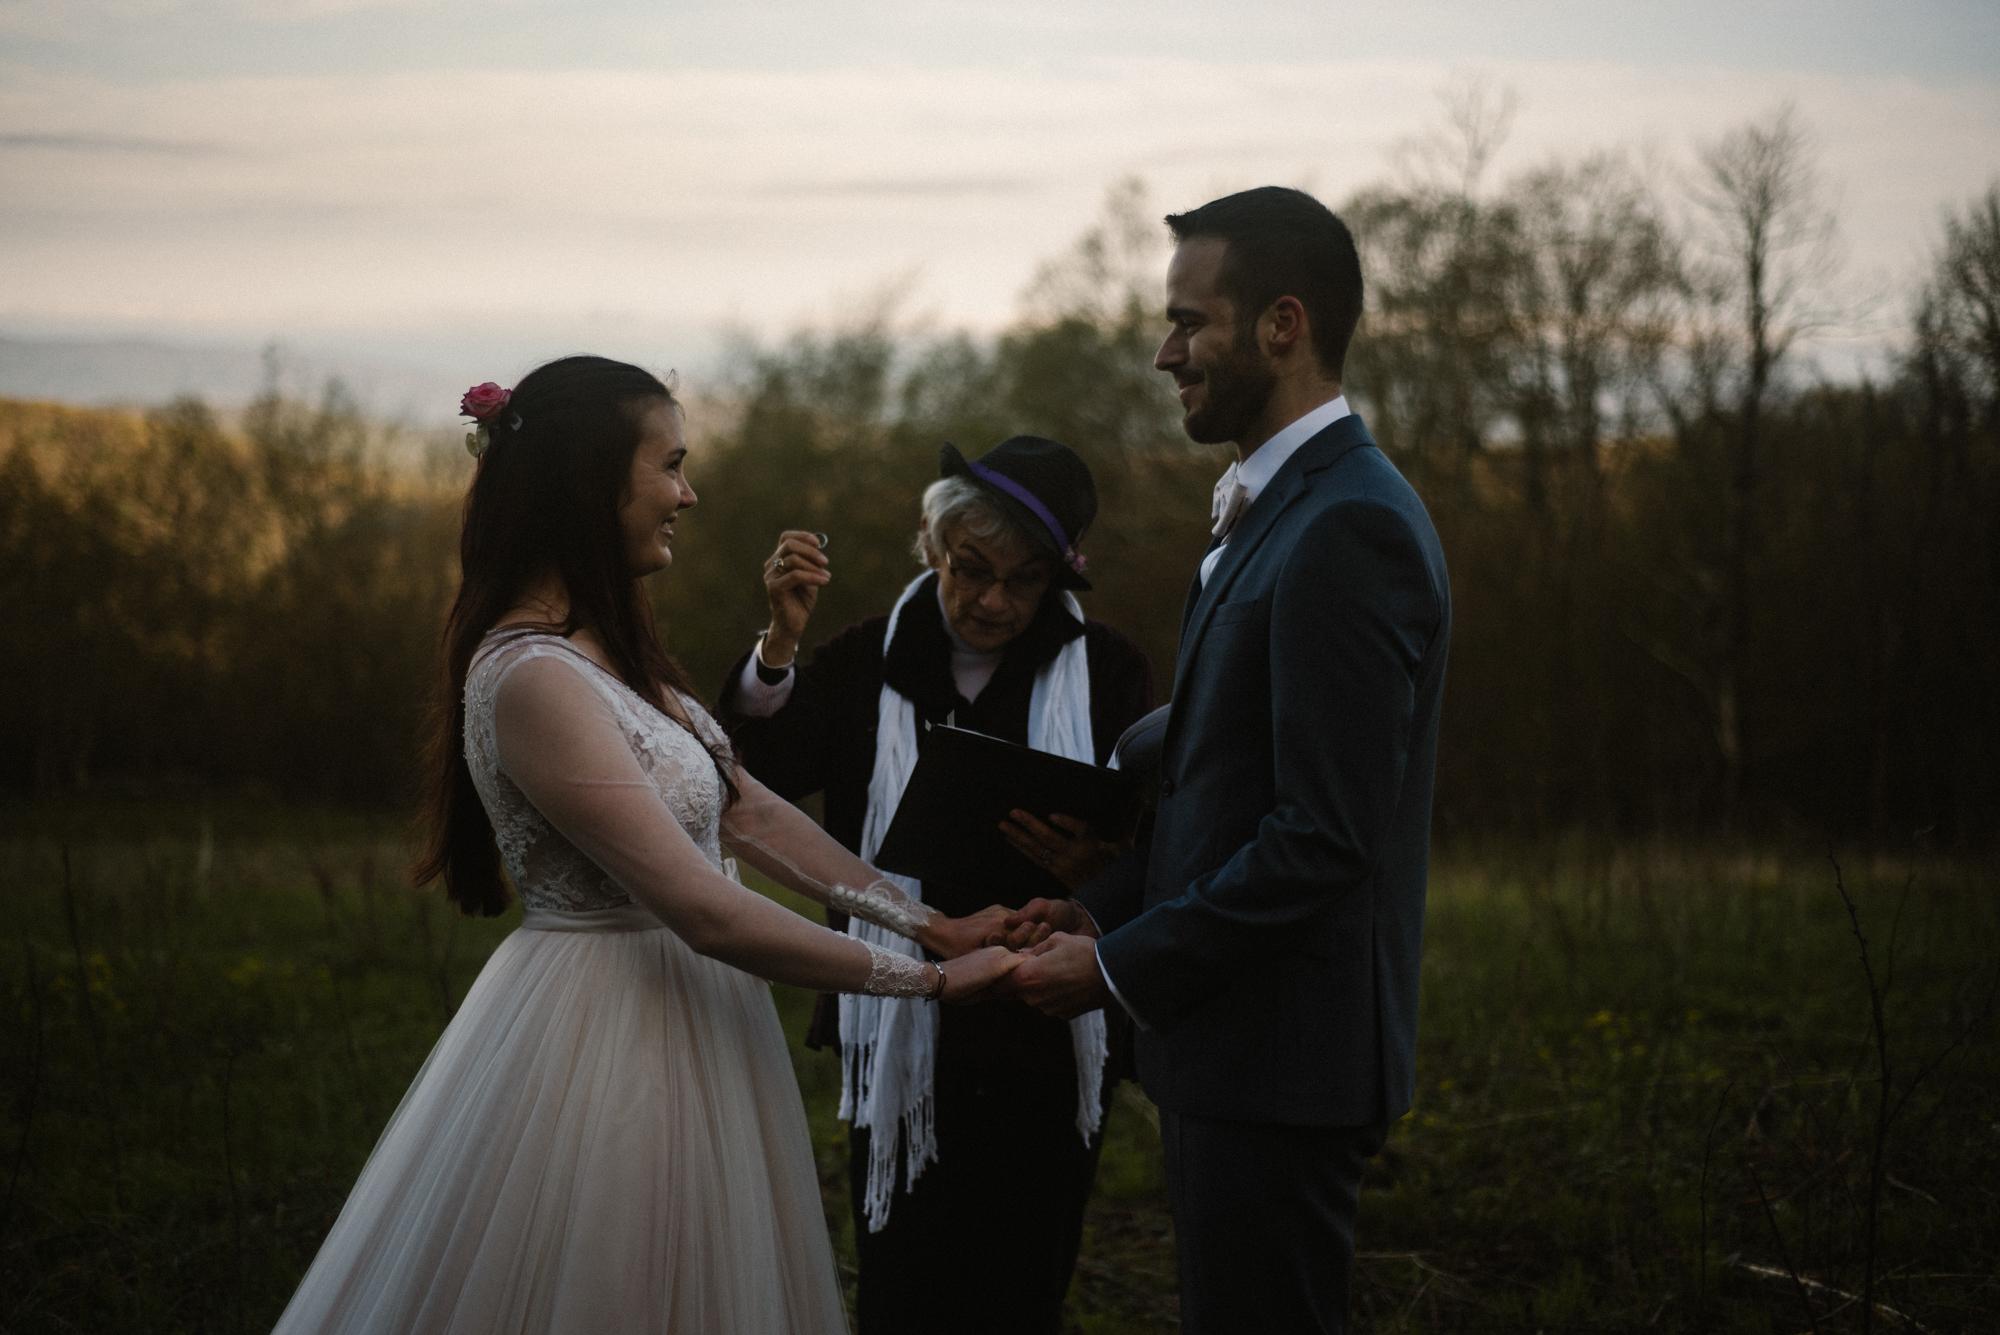 Paula and Andrew - Small Adventurous Wedding in Shenandoah National Park - Blue Ridge Mountain Wedding - White Sails Creative - Mountain Elopement_18.jpg